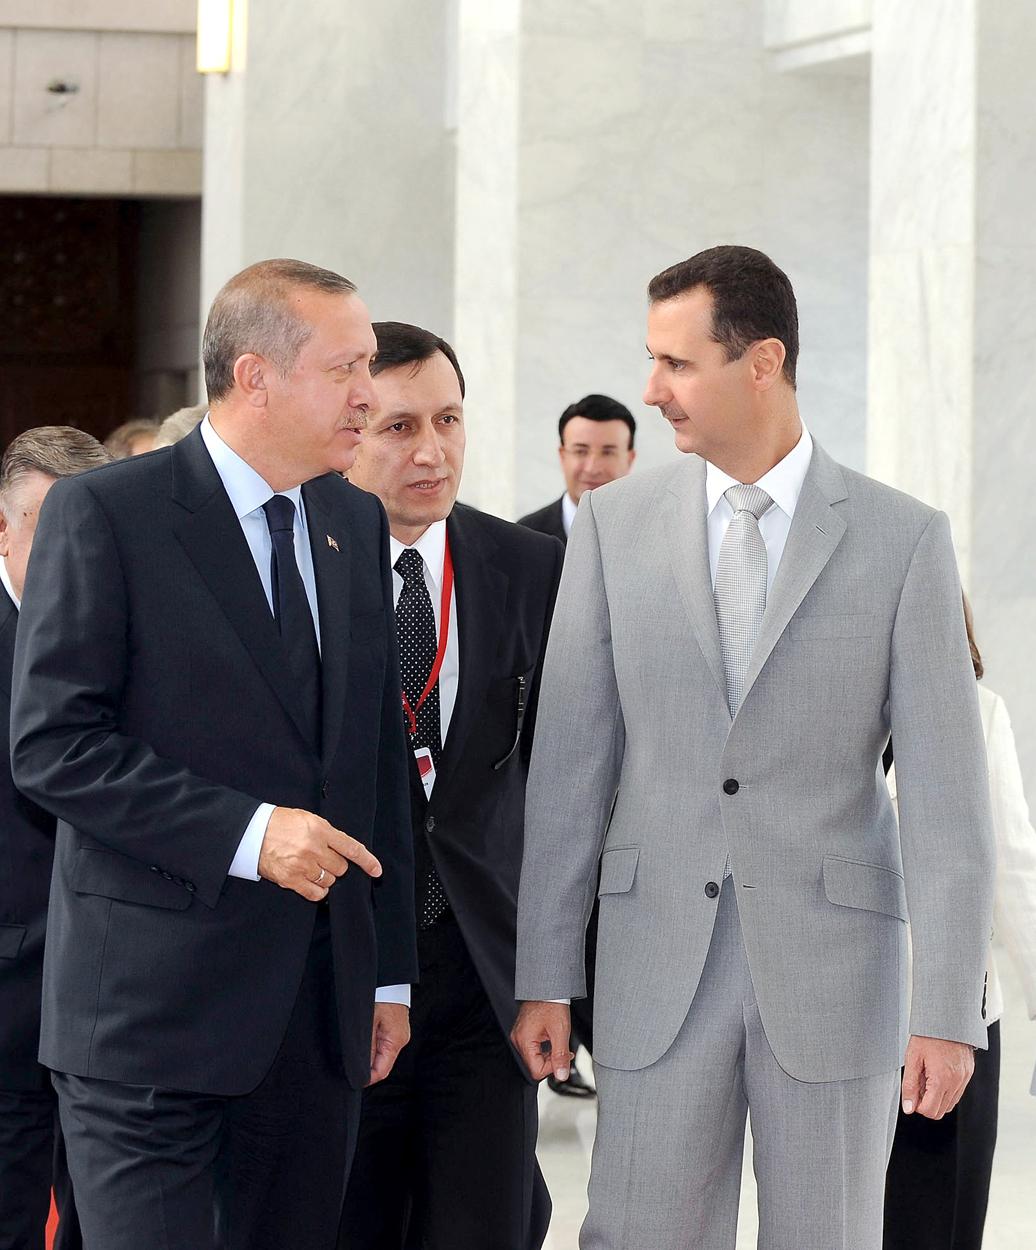 Turkish President Recep Tayyip Erdogan and Syrian President Bashar al-Assad during Erdogan's visit to Damascus in 2010 (KUNA)